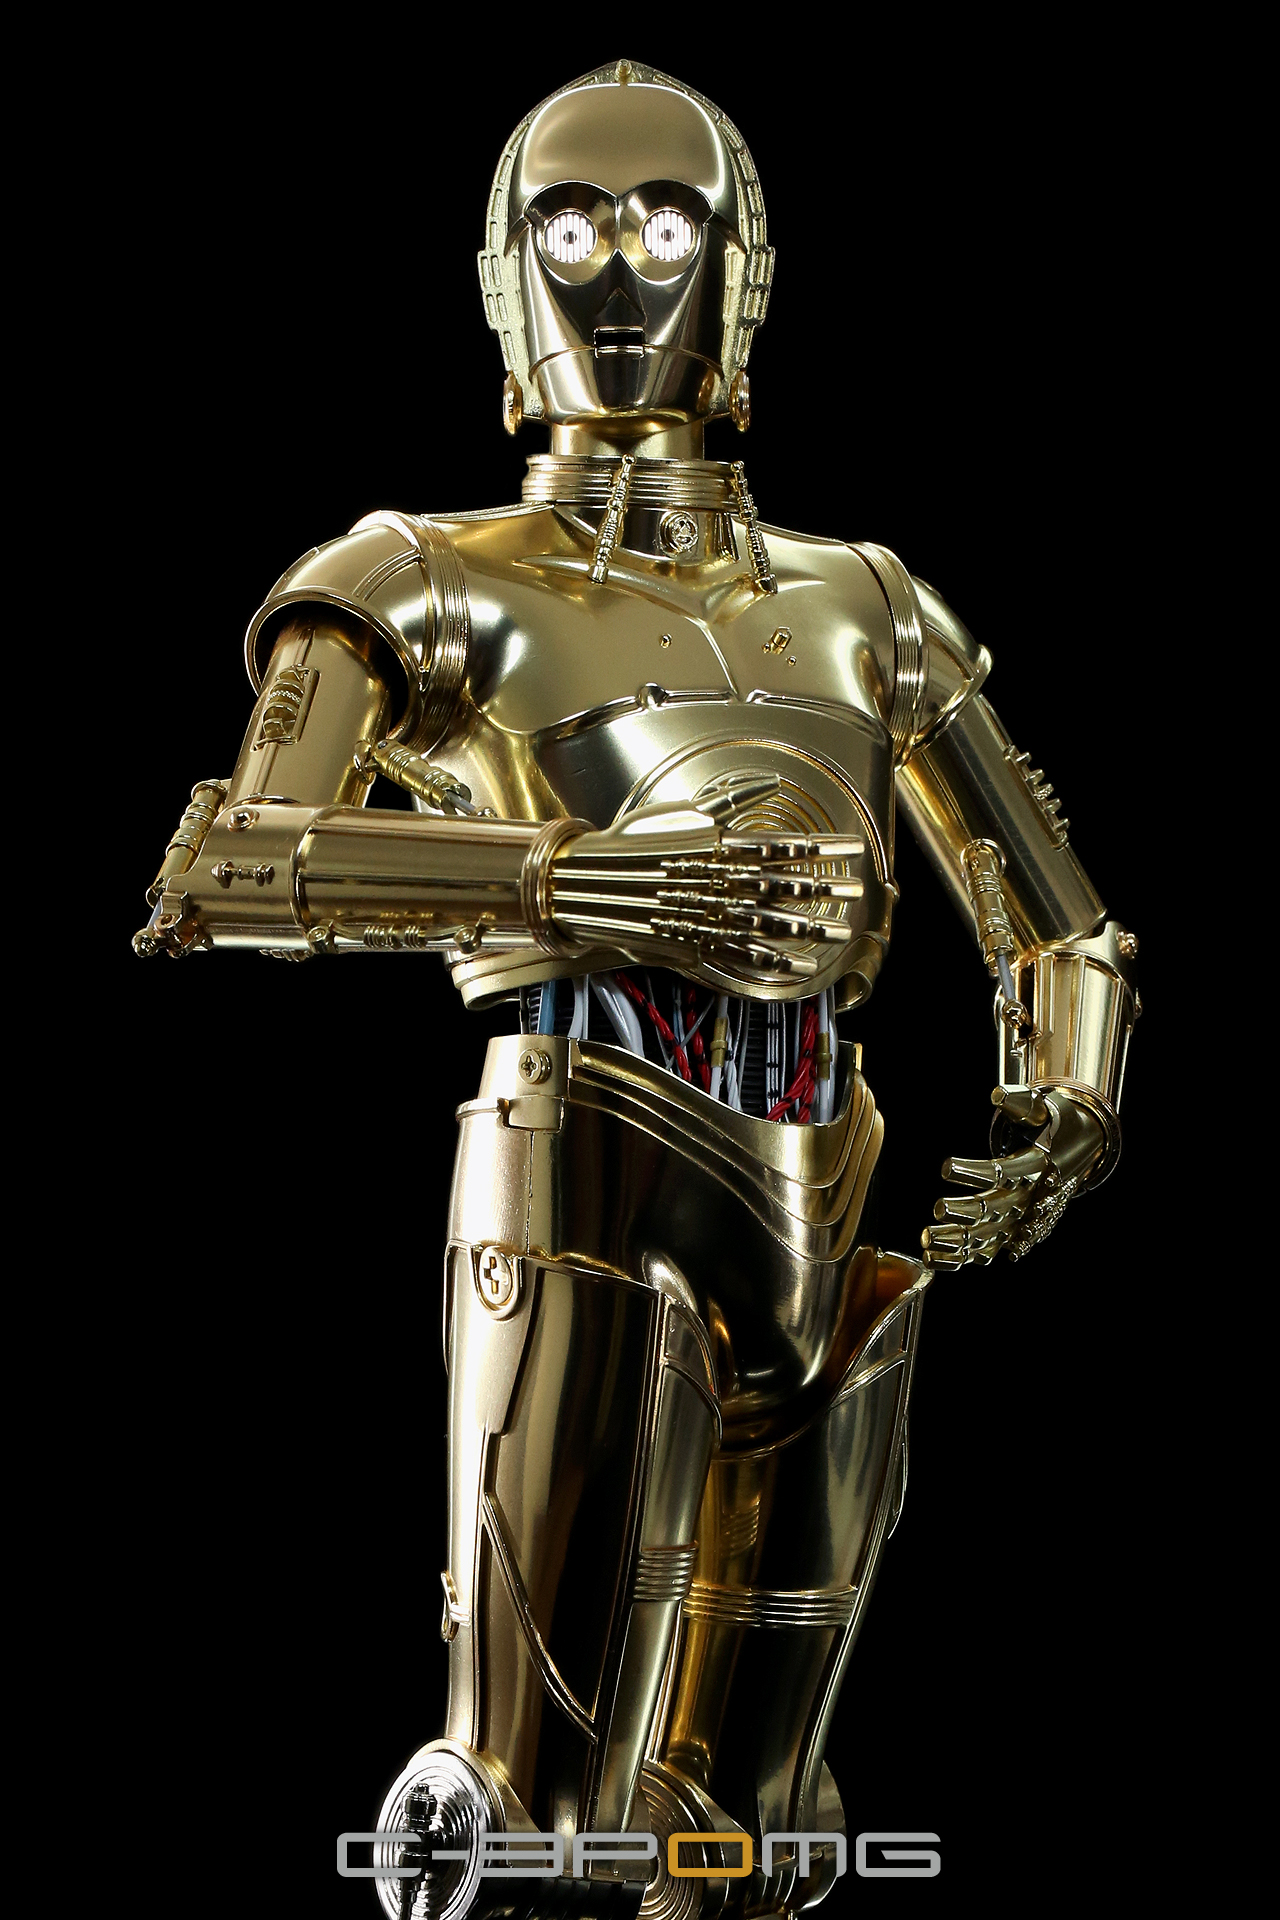 [Bandai] Star Wars: C-3PO - Perfect Model 1/6 scale - LANÇADO!!! - Página 2 C-3PO1017_zps4ef28934